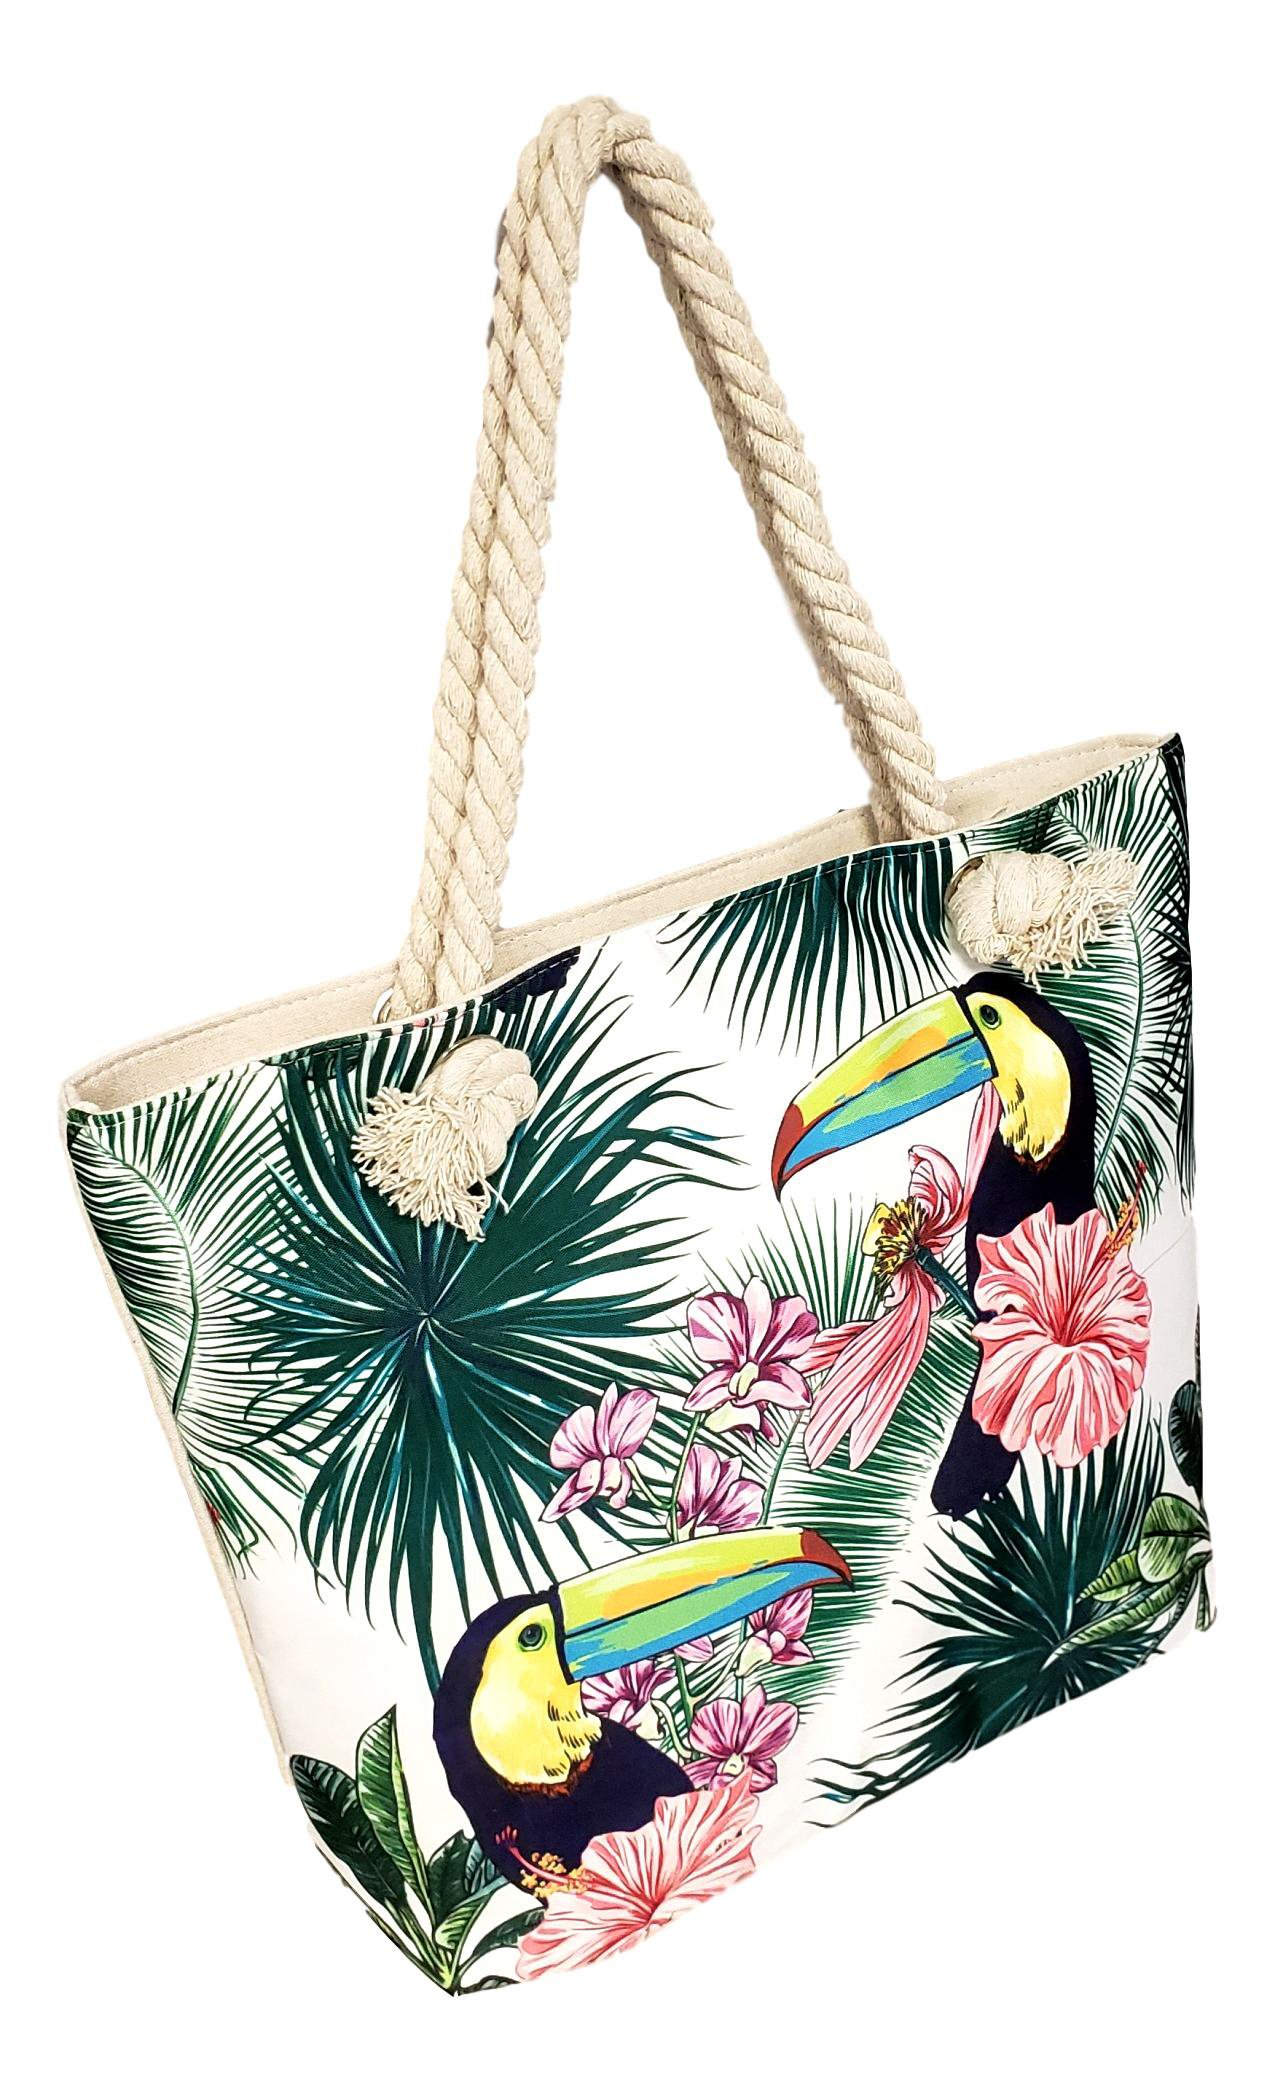 Summer Prints Medium Sized Zipper Top Canvas Beach Bag Tote (Tropical Toucans)